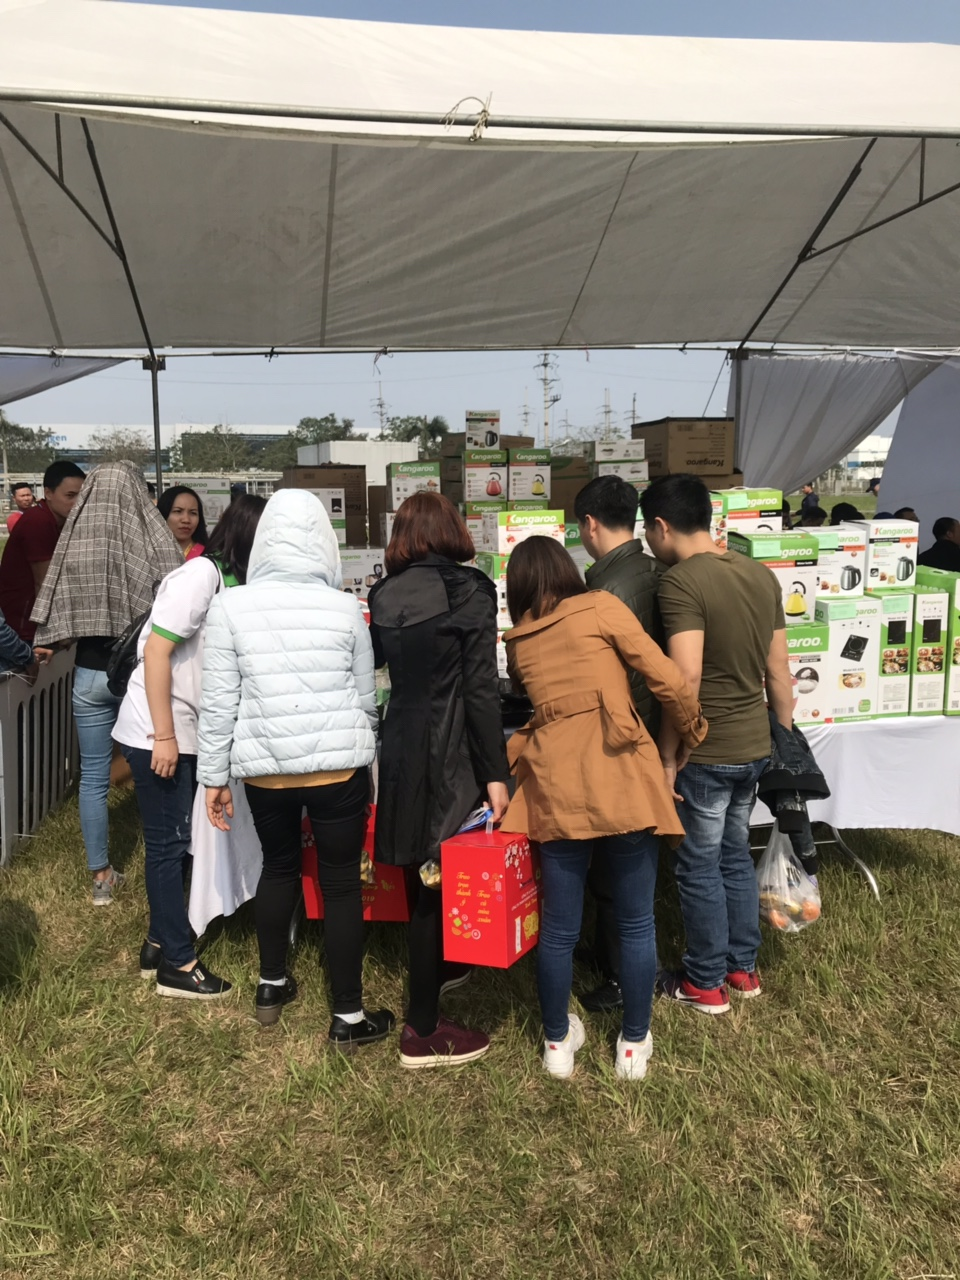 KangarooStore.vn tham dự Hội chợ Fushan 2019 - 5